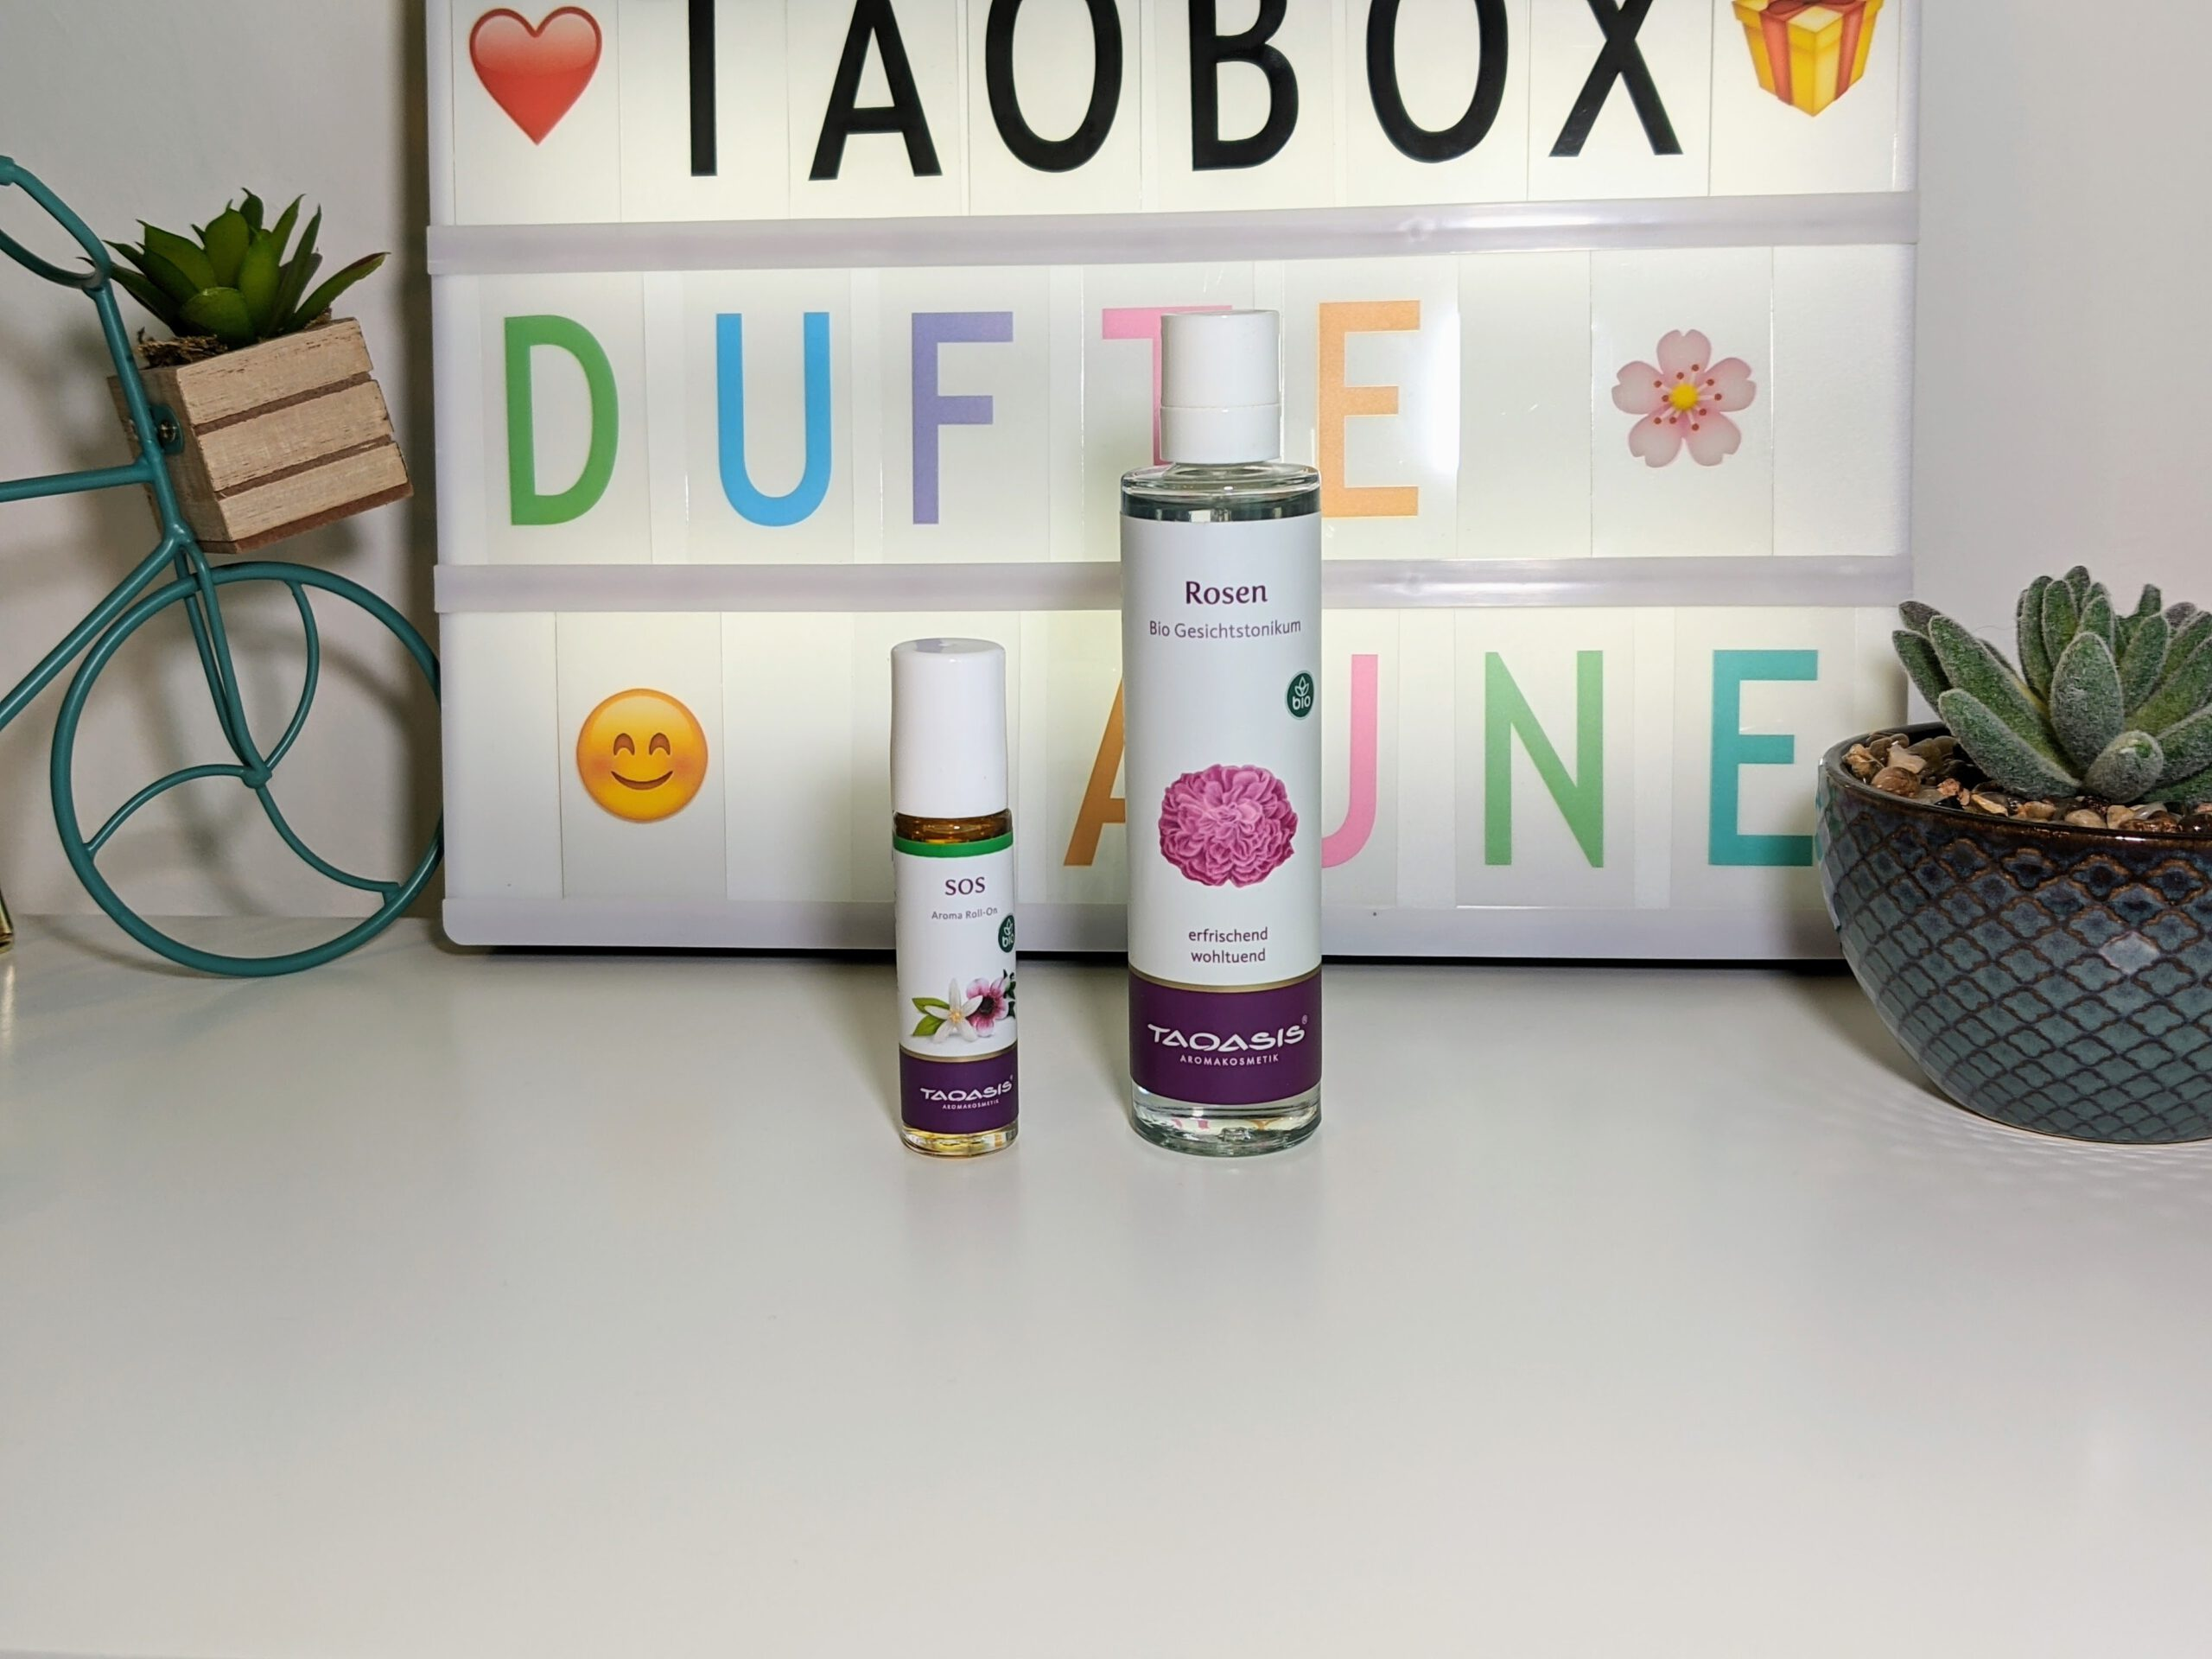 TaoBox – Dufte Laune – Rosen Gesichtstonikum und SOS Aroma Roll-On